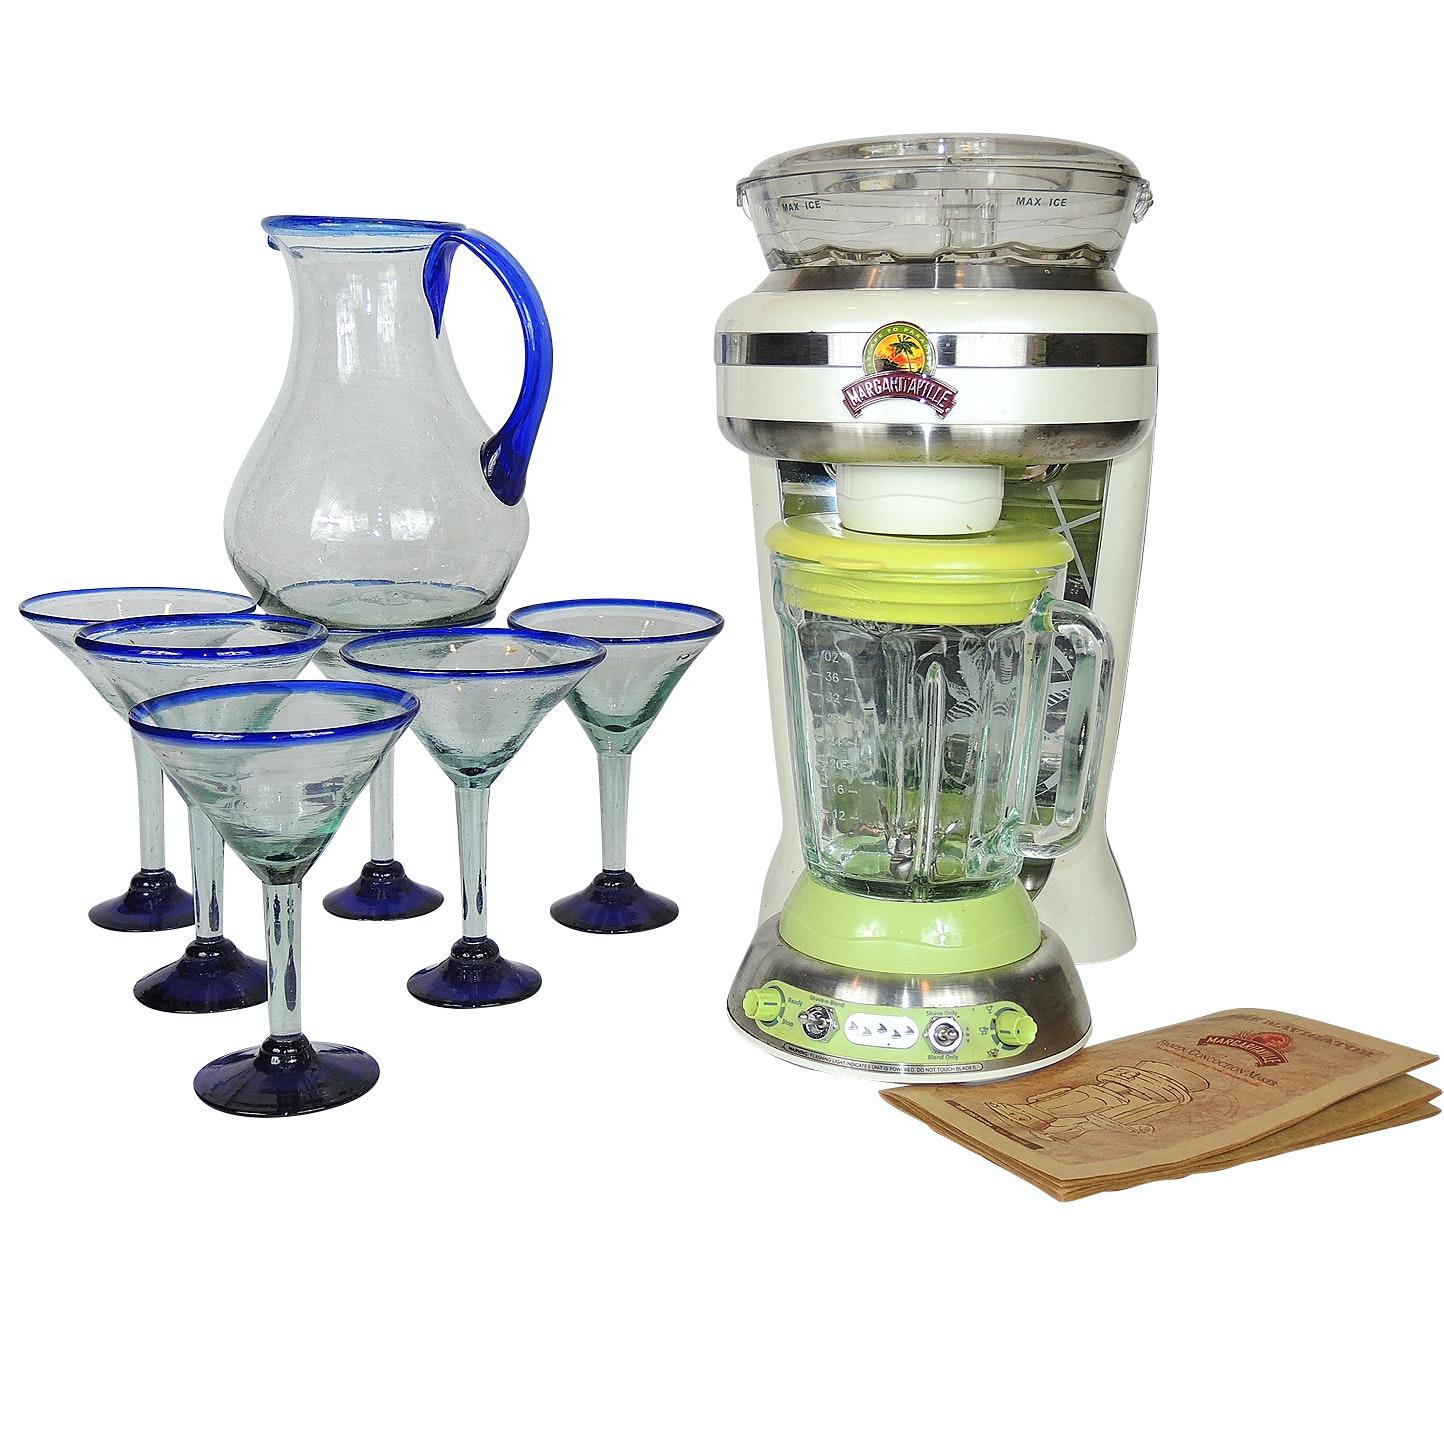 "Margaritaville ""The Navigator"" Frozen Concoction Maker, Pitcher and Glass Set"